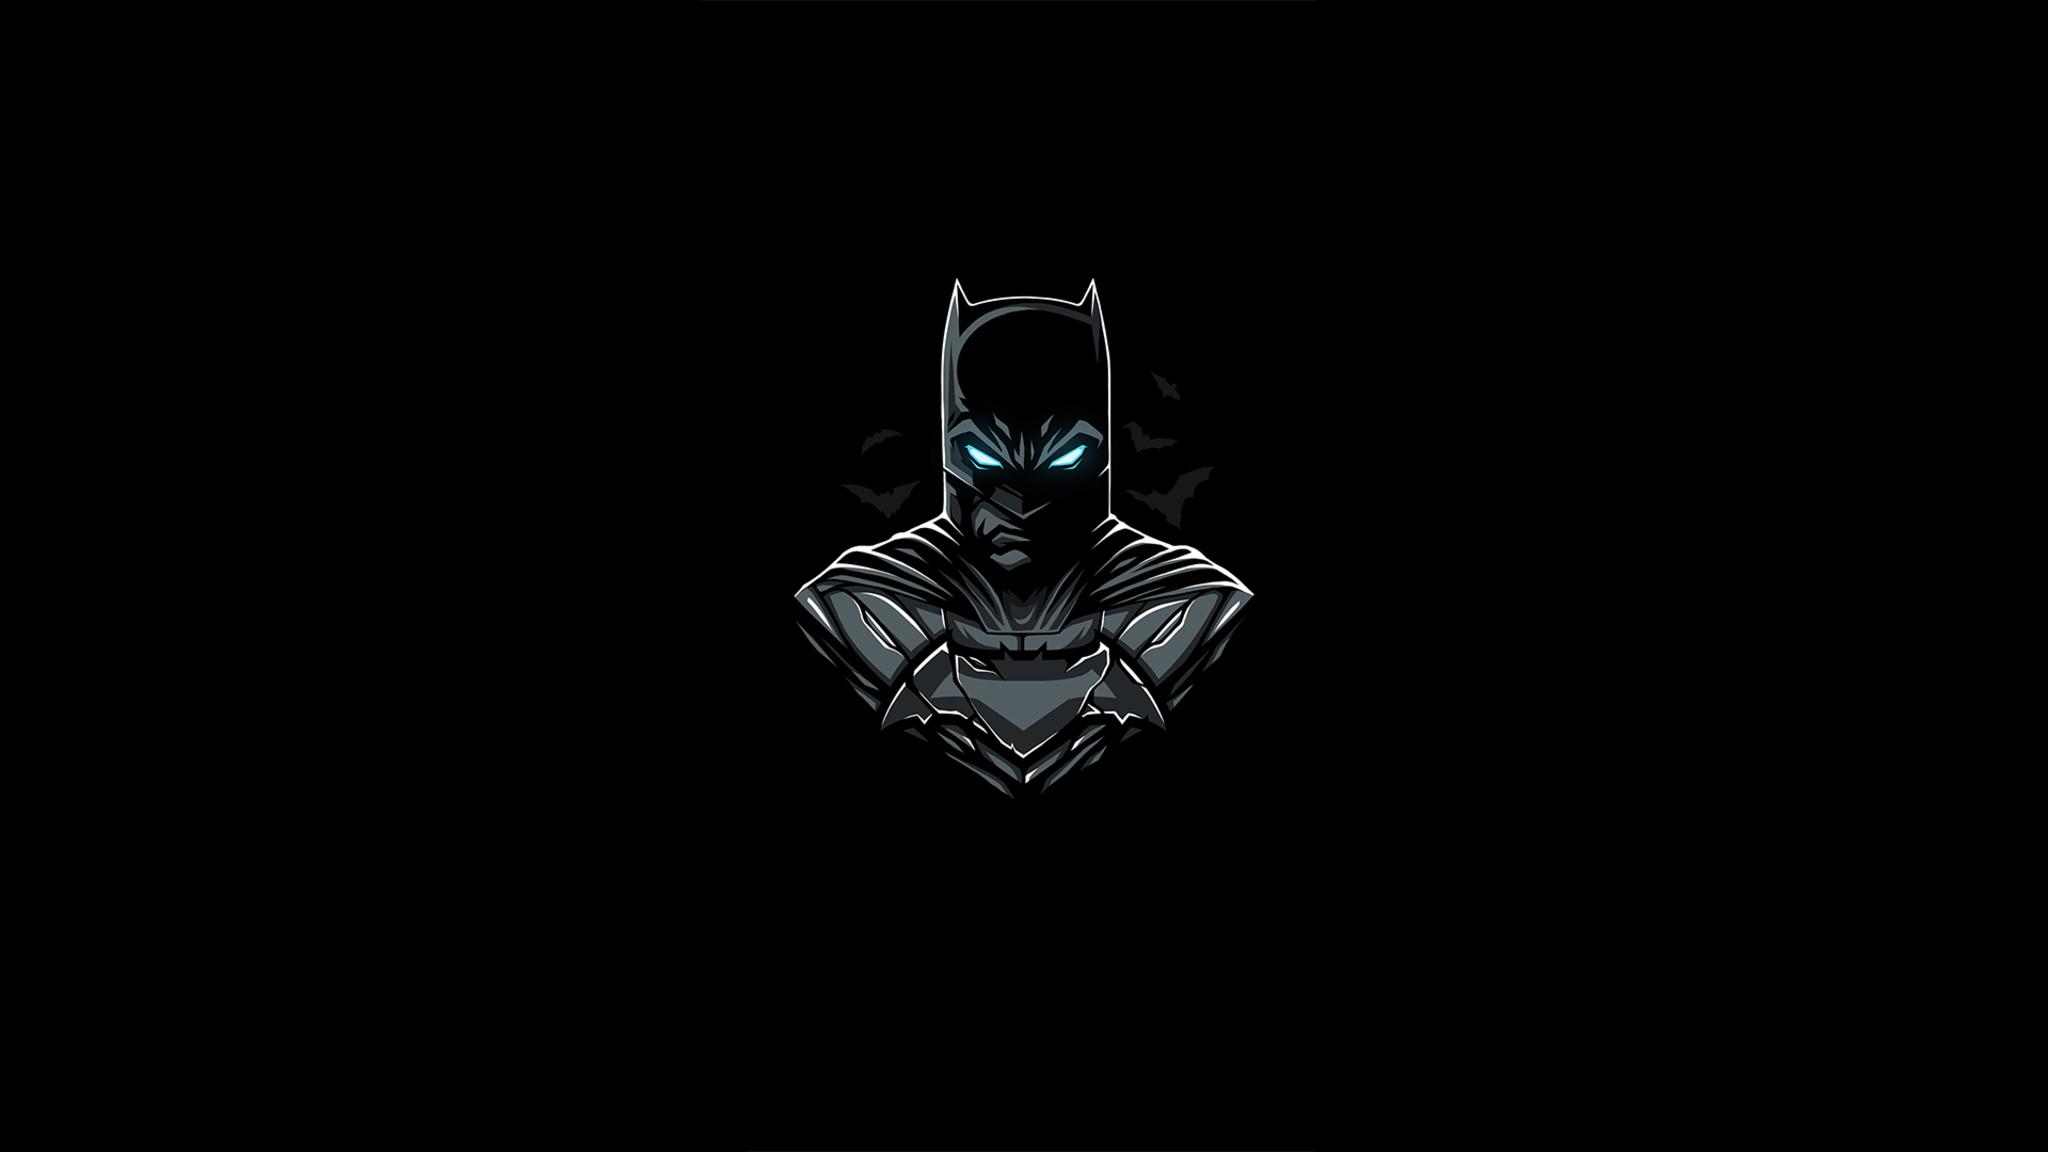 batman-amoled-0a.jpg